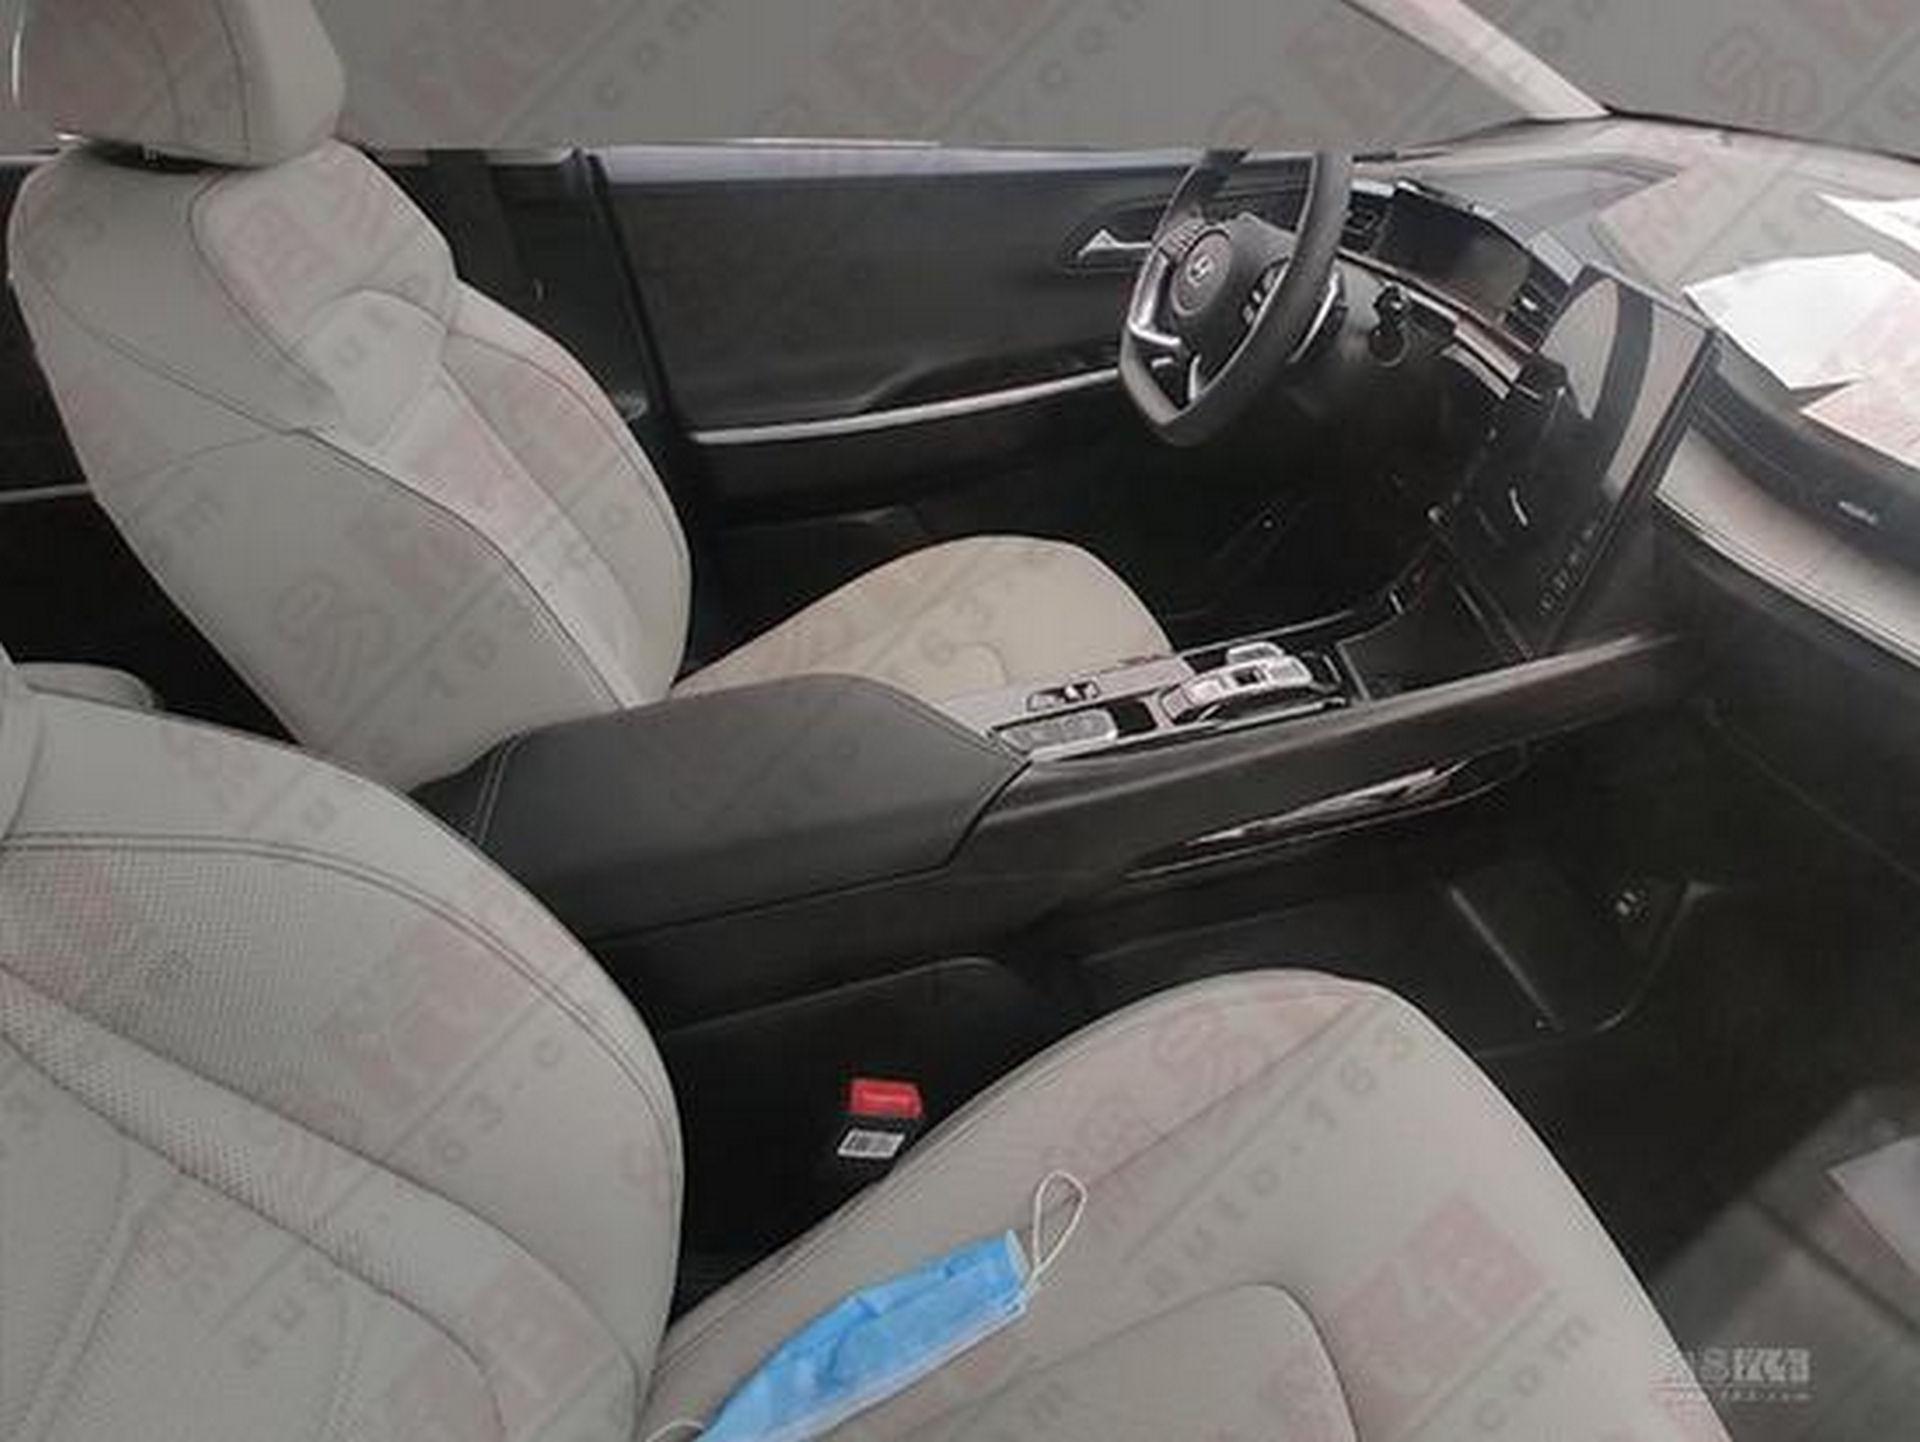 Hyundai_Custo_leaked_0011